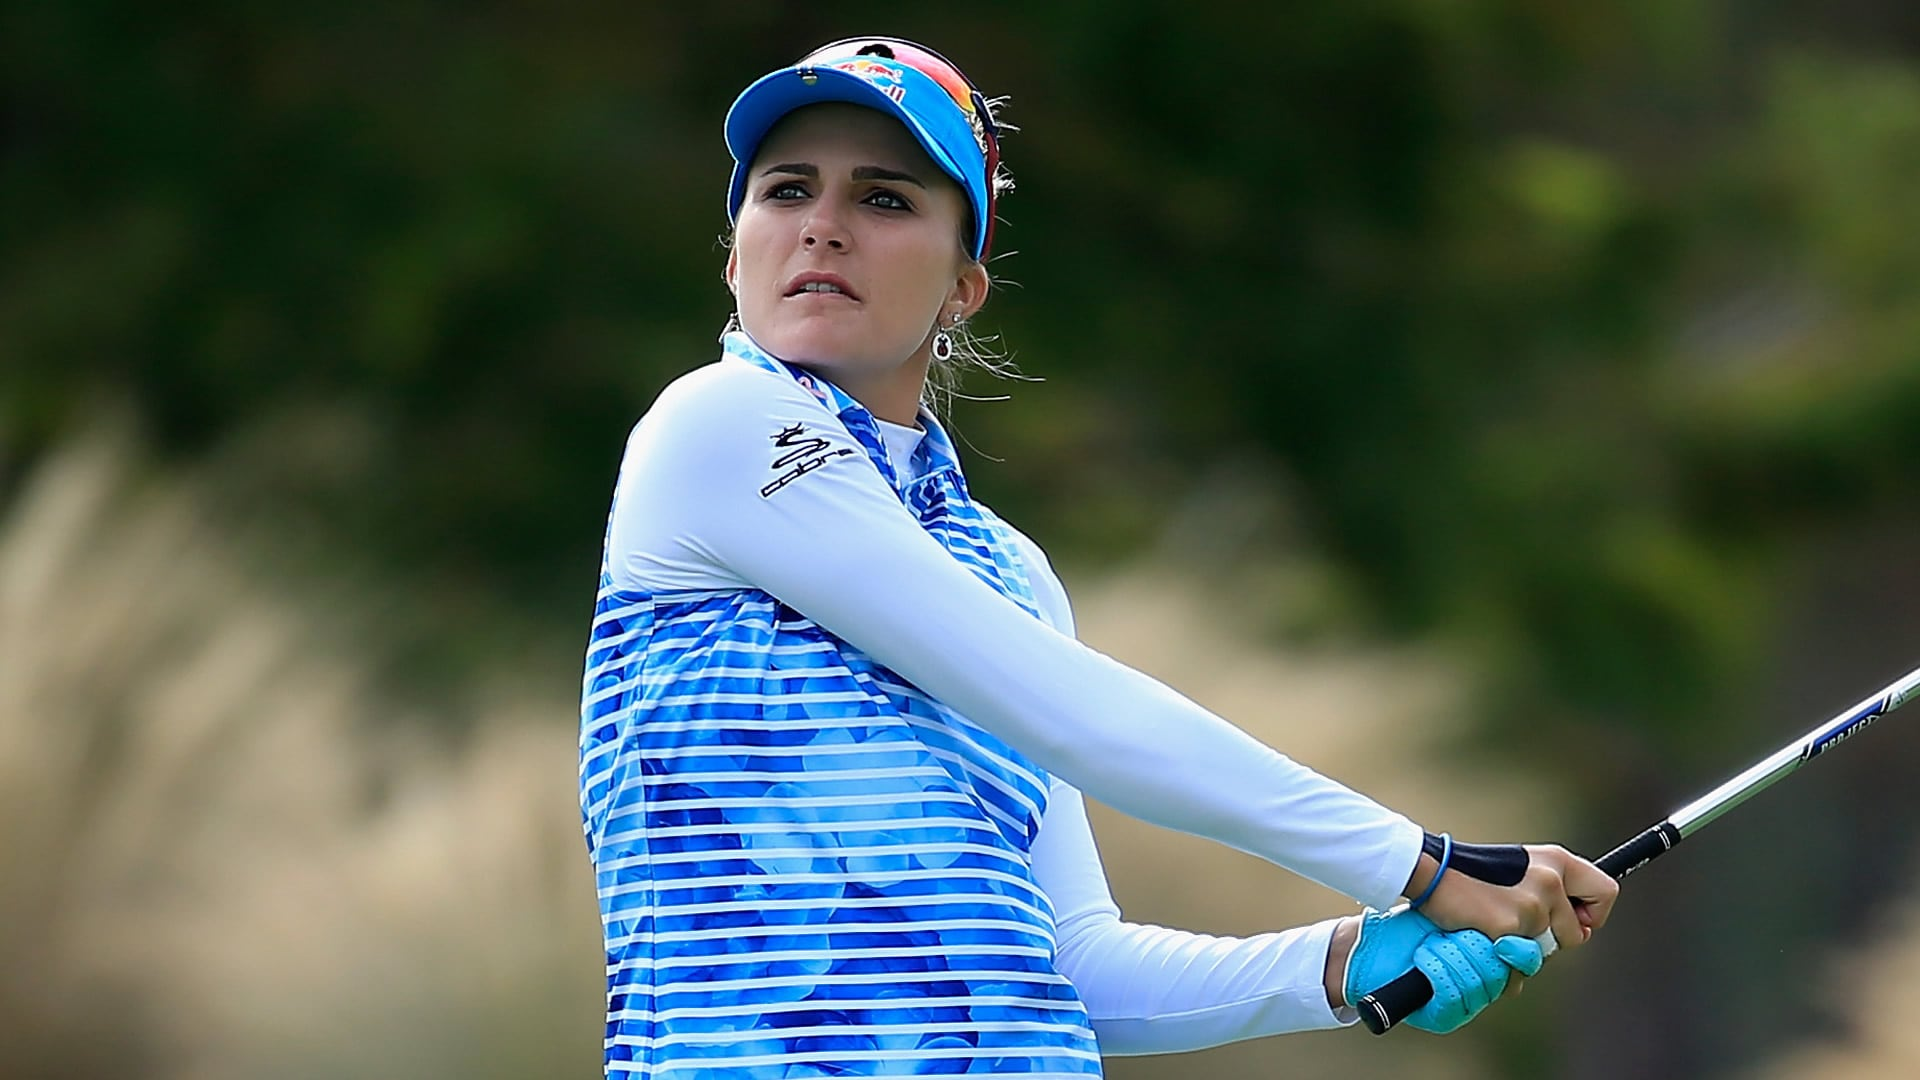 Lpga Major Champs Test Game Against Champions Celebs Golf Channel